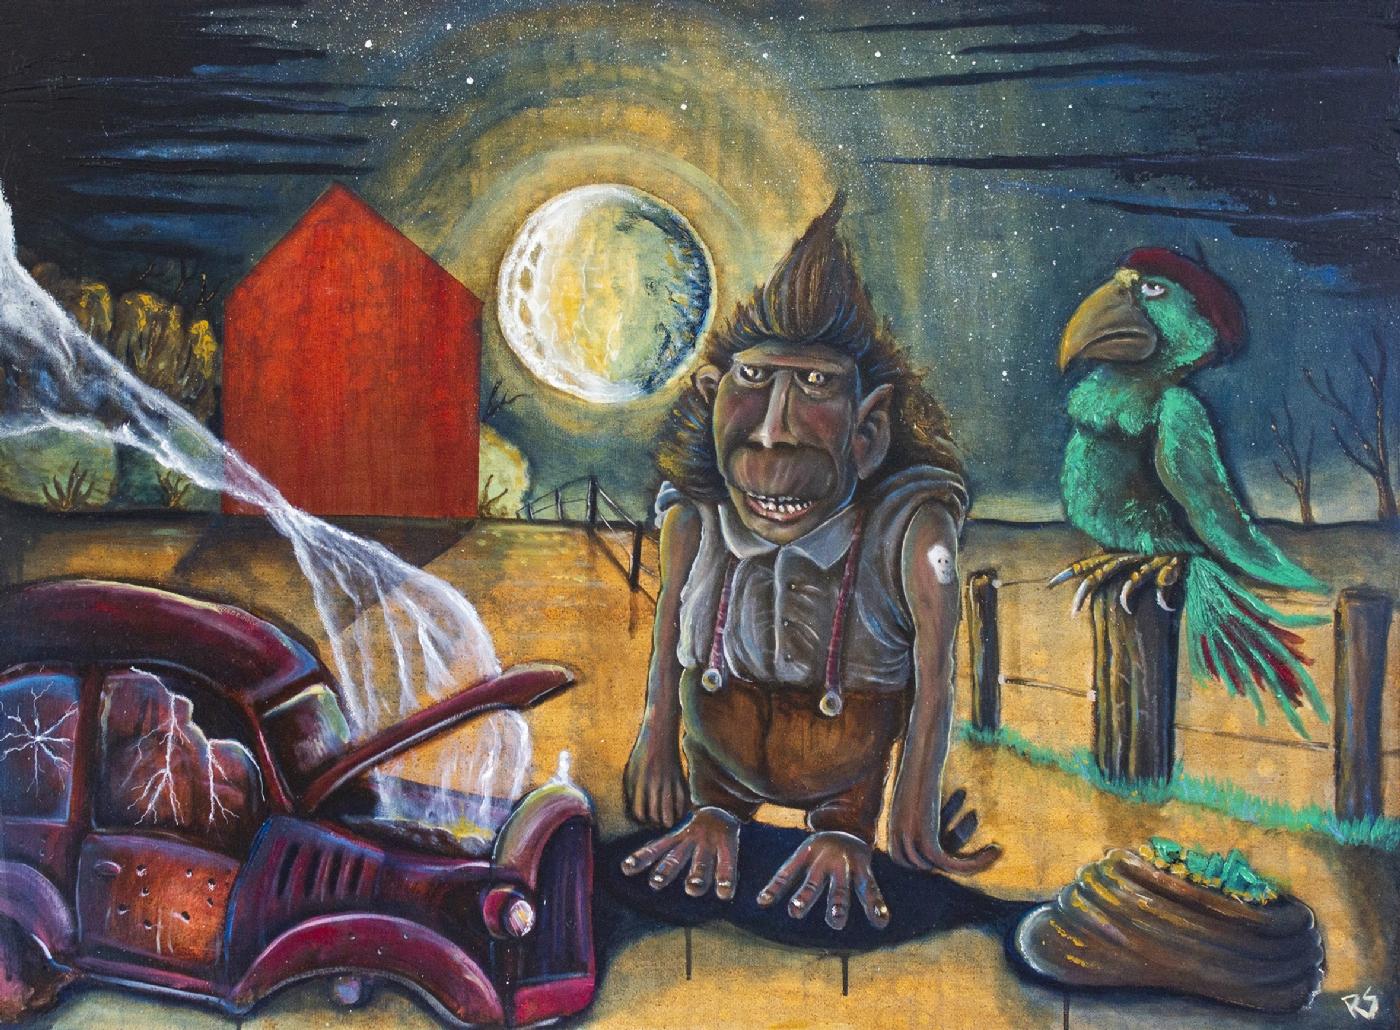 Tweeter and the monkeyman | Maleri